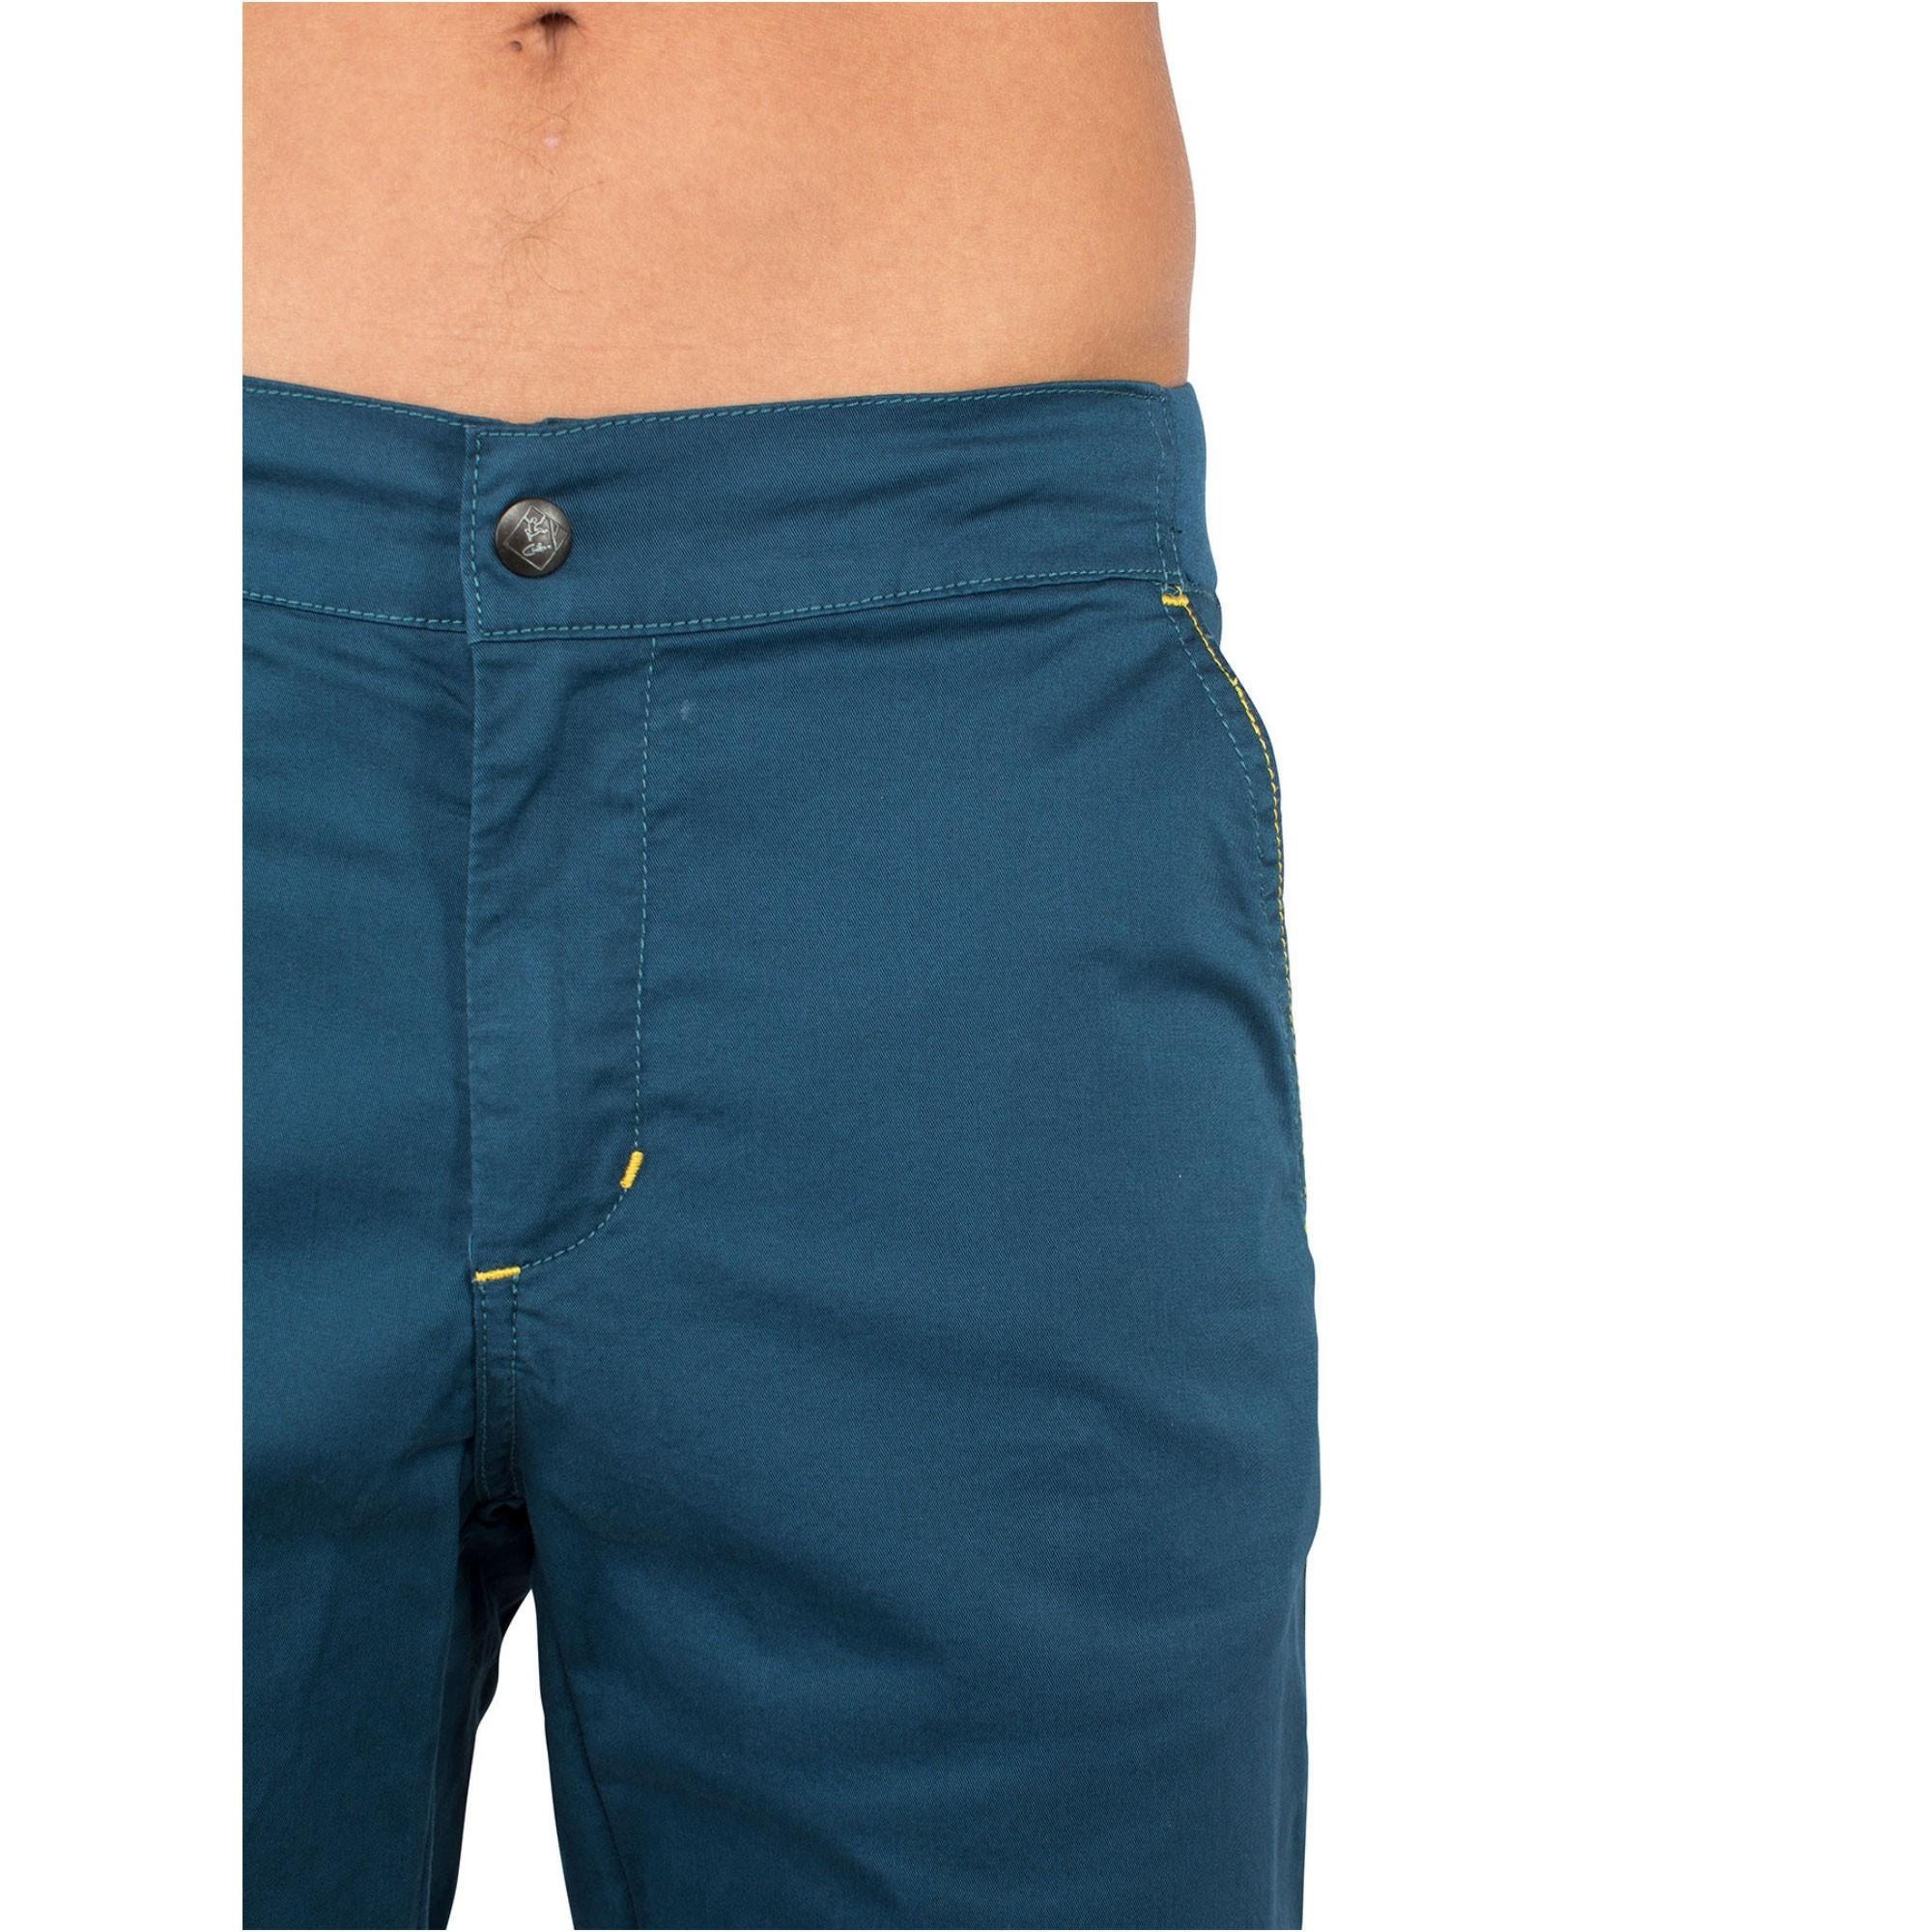 Chillaz Rookie Pant 1 S18 - Dark Blue